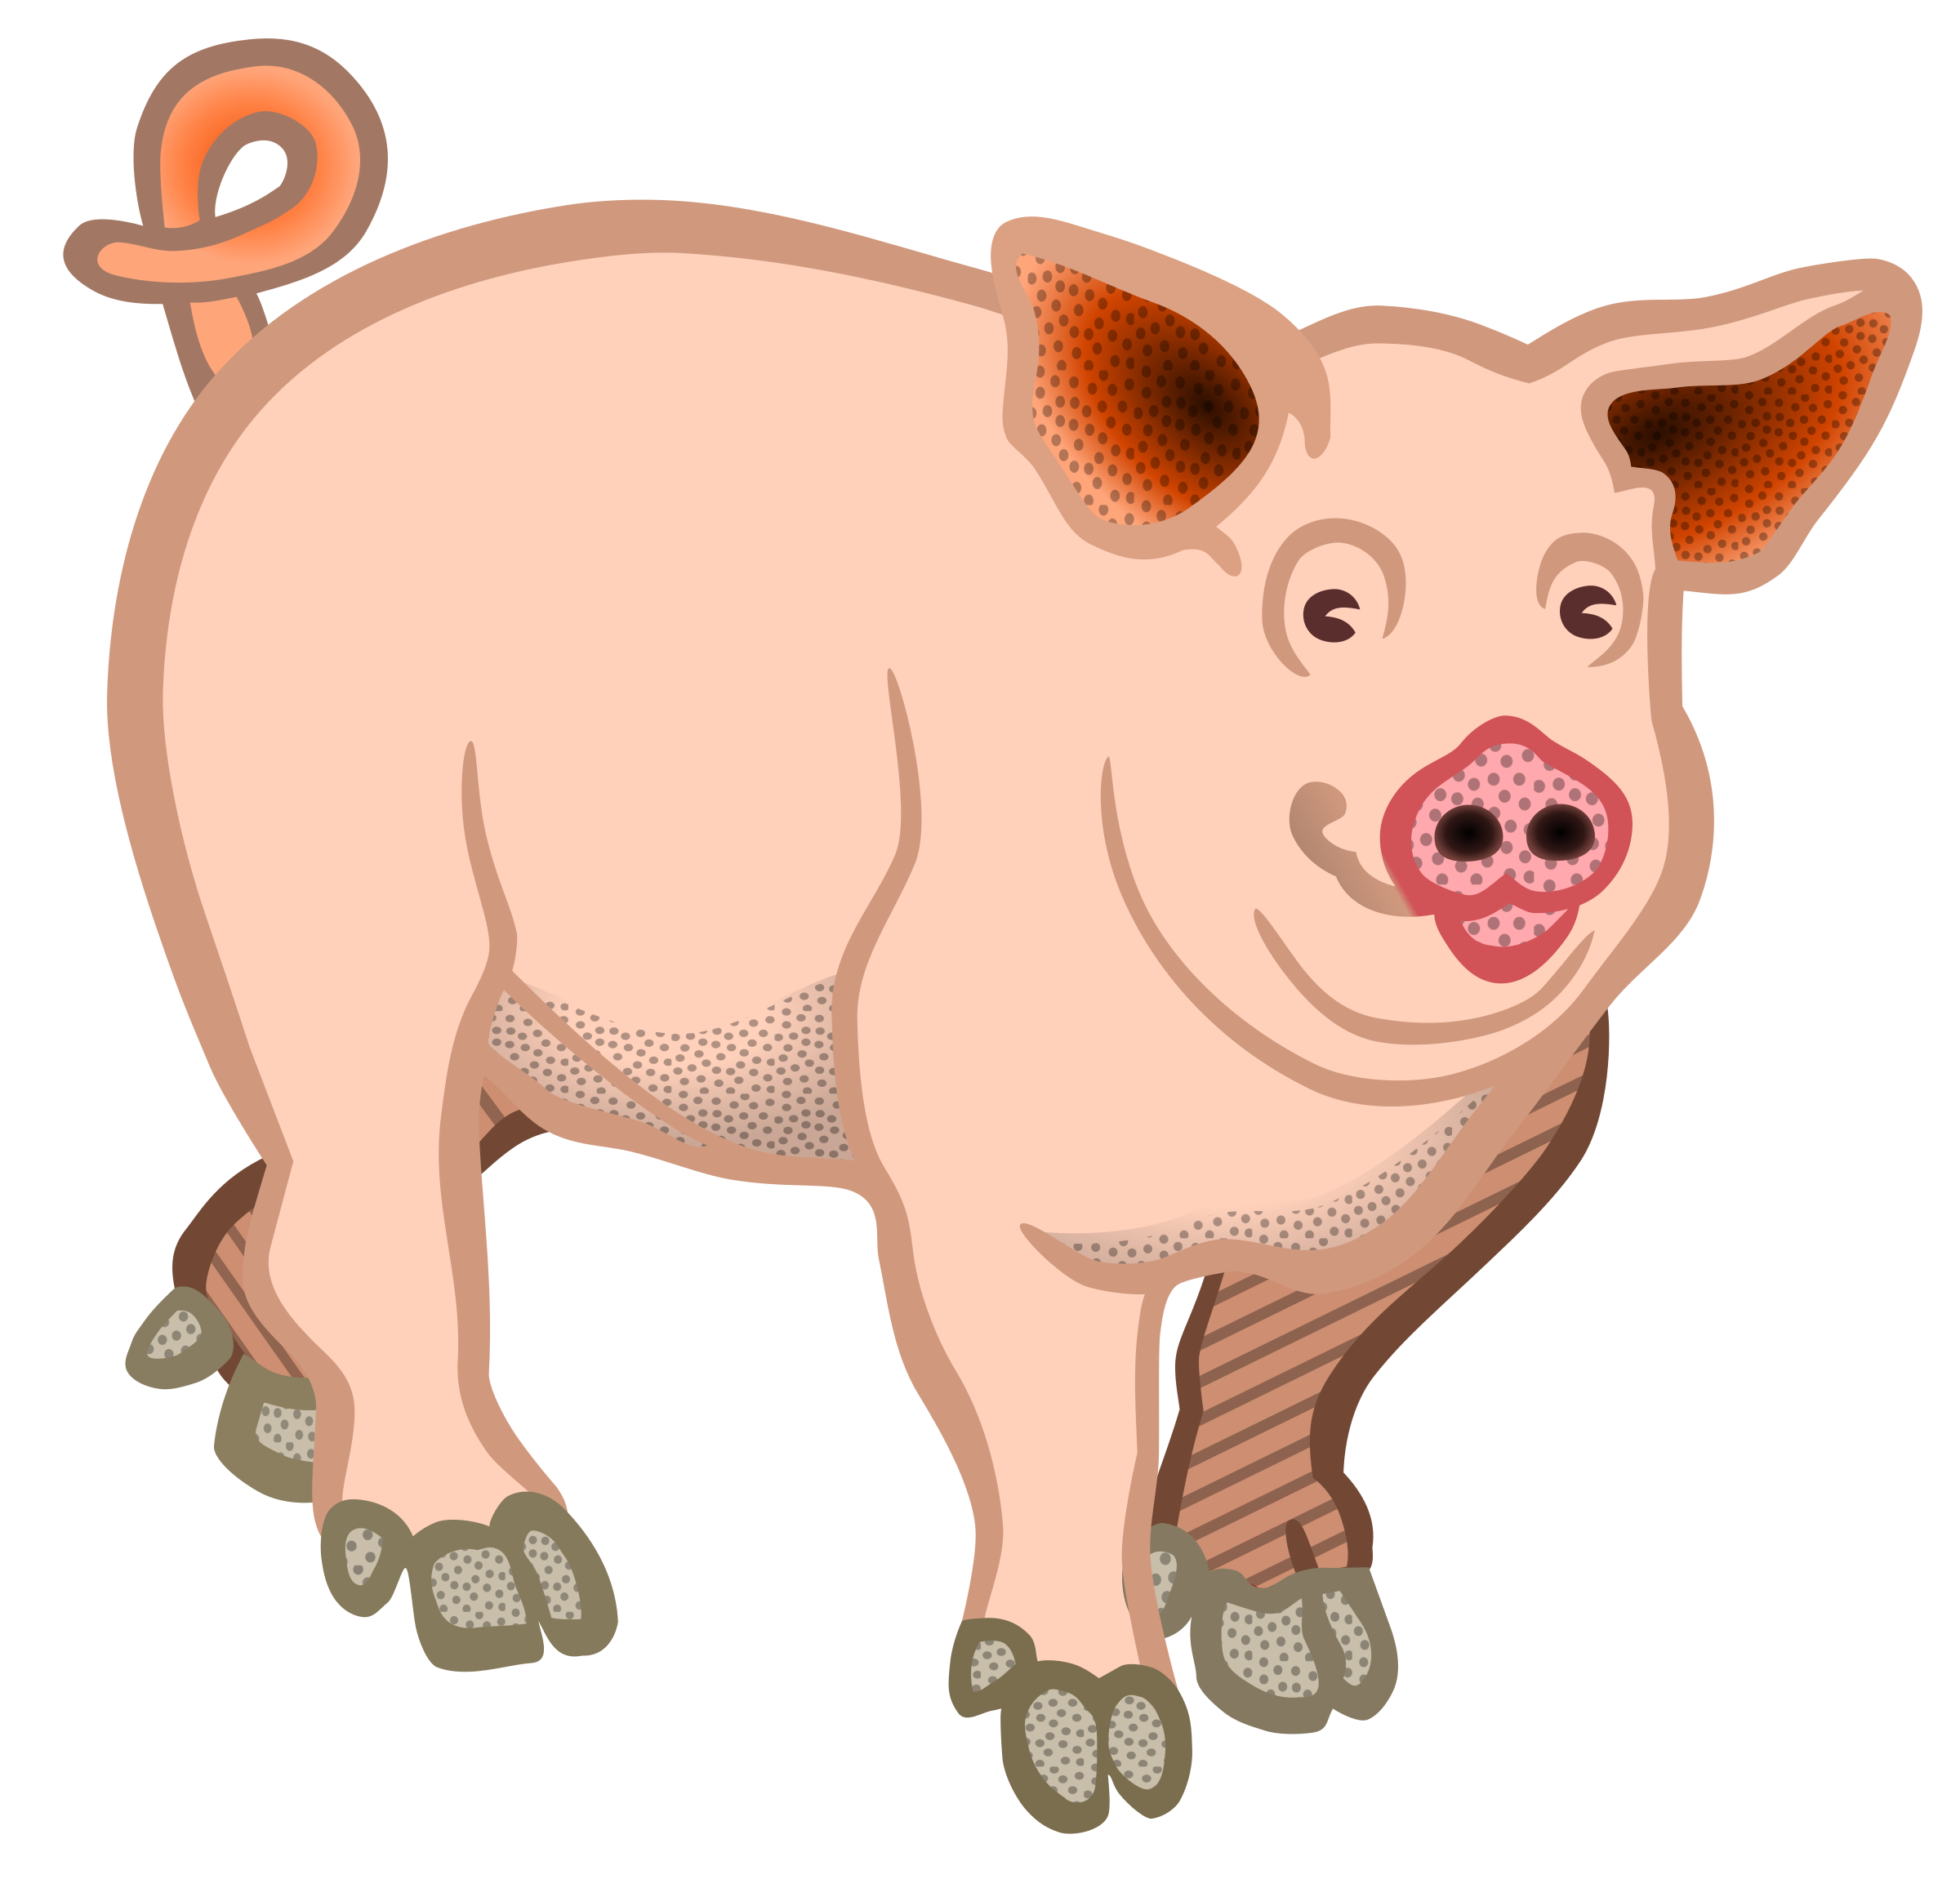 Pig clipart teacher. Coloured big image png